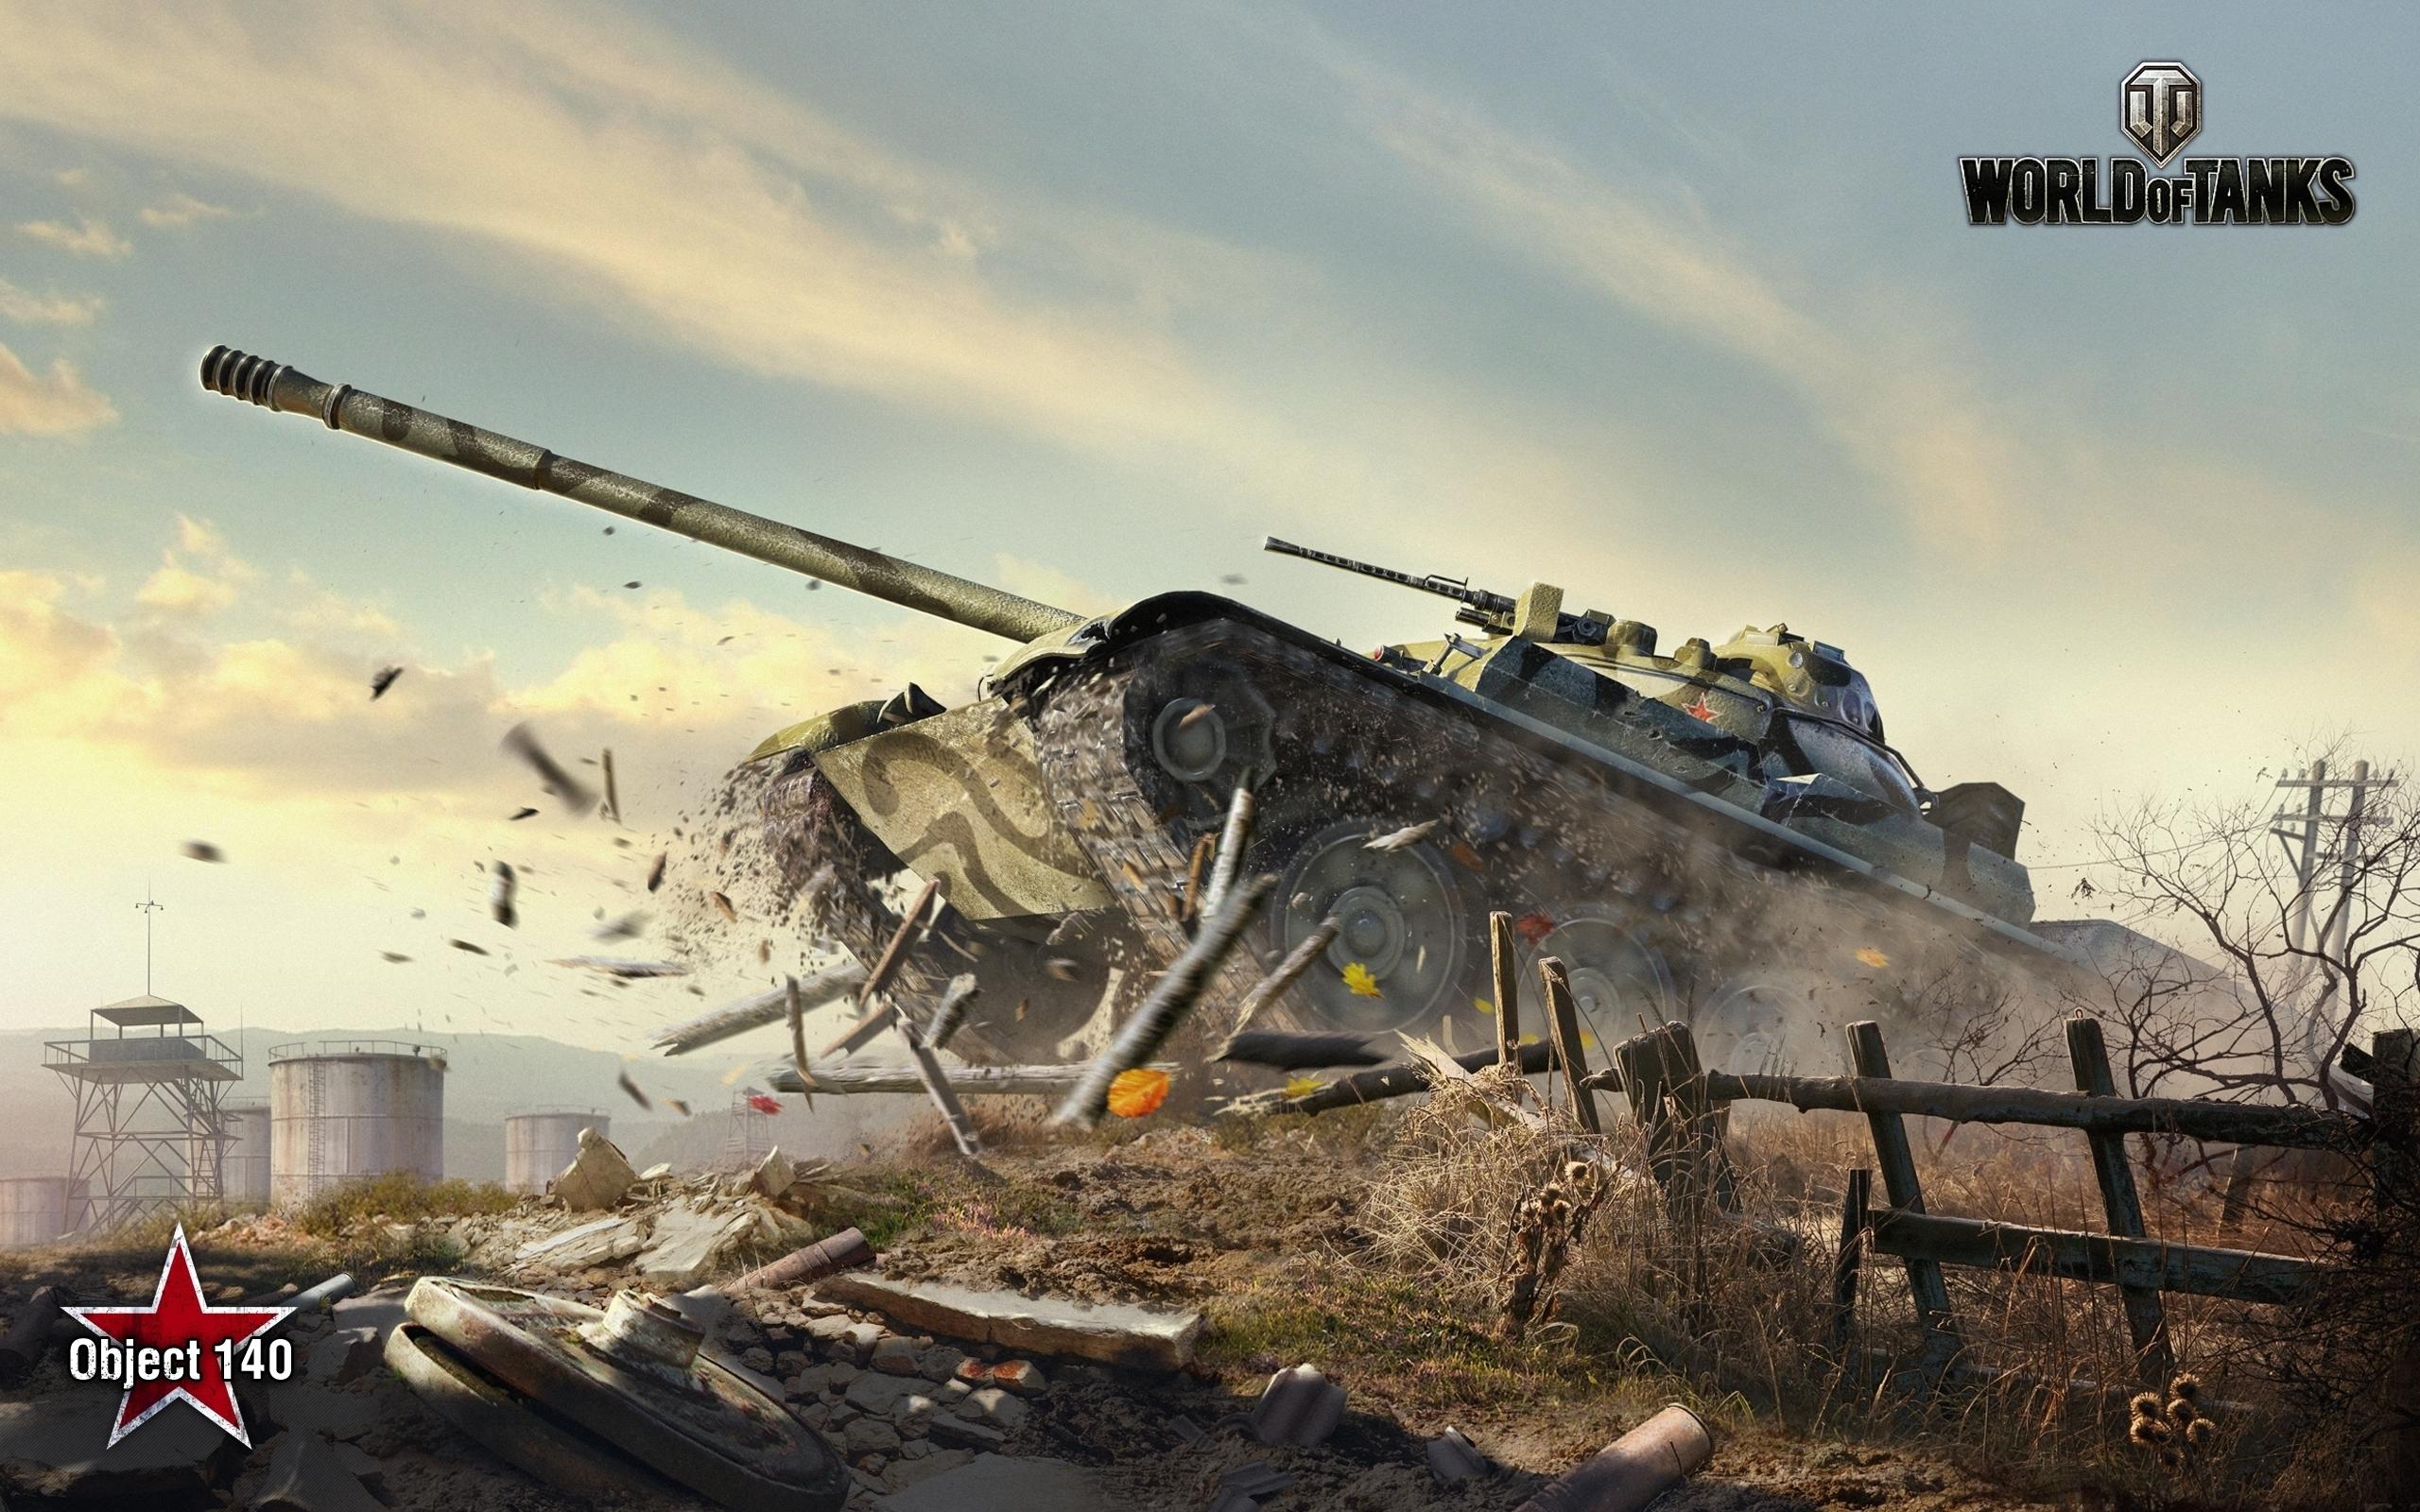 Obj World Of Tanks 26435 Hd Wallpaper